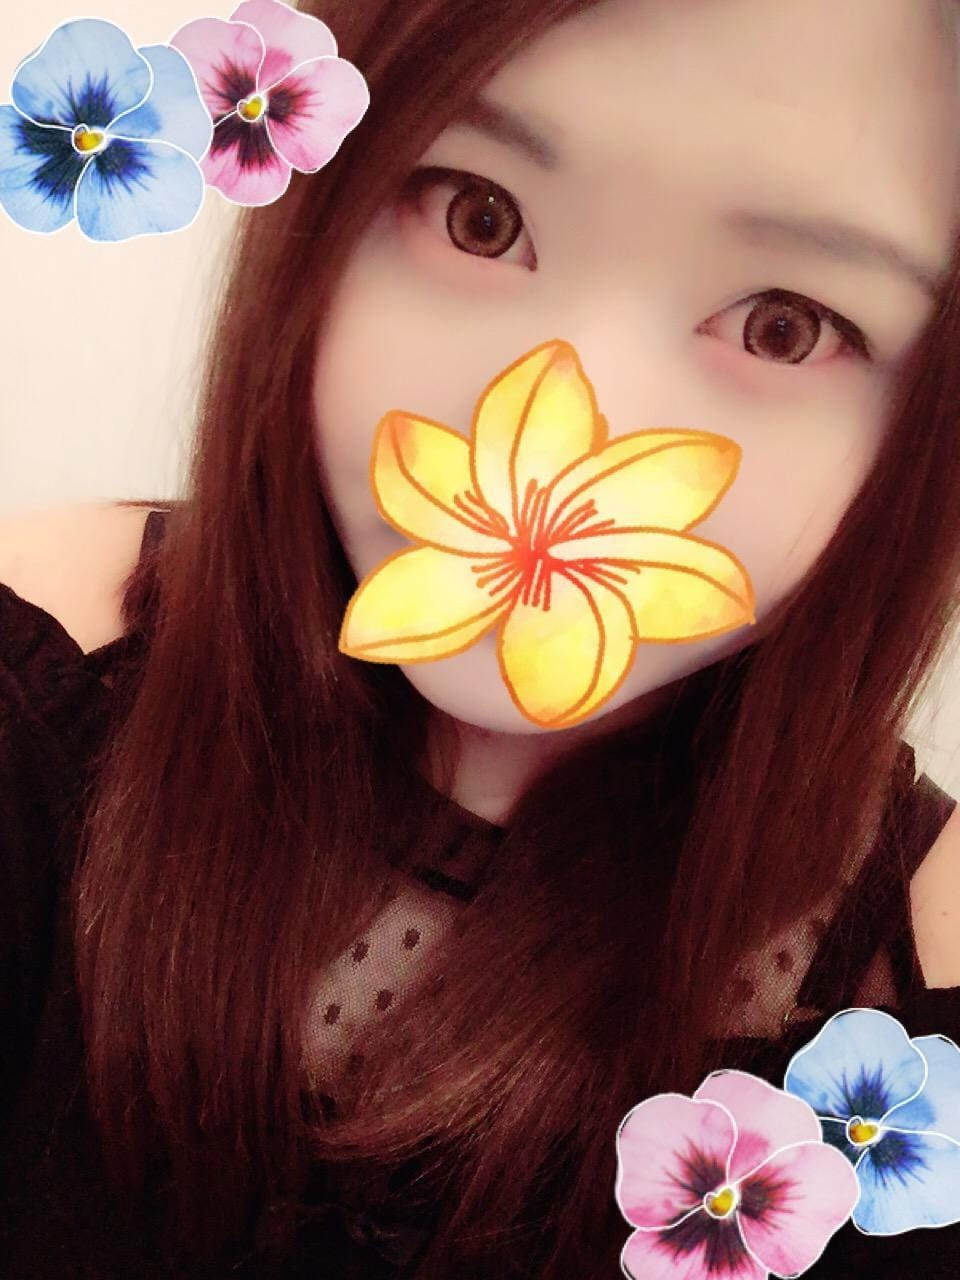 「October 12th ★」10/12(10/12) 17:53 | まどかの写メ・風俗動画